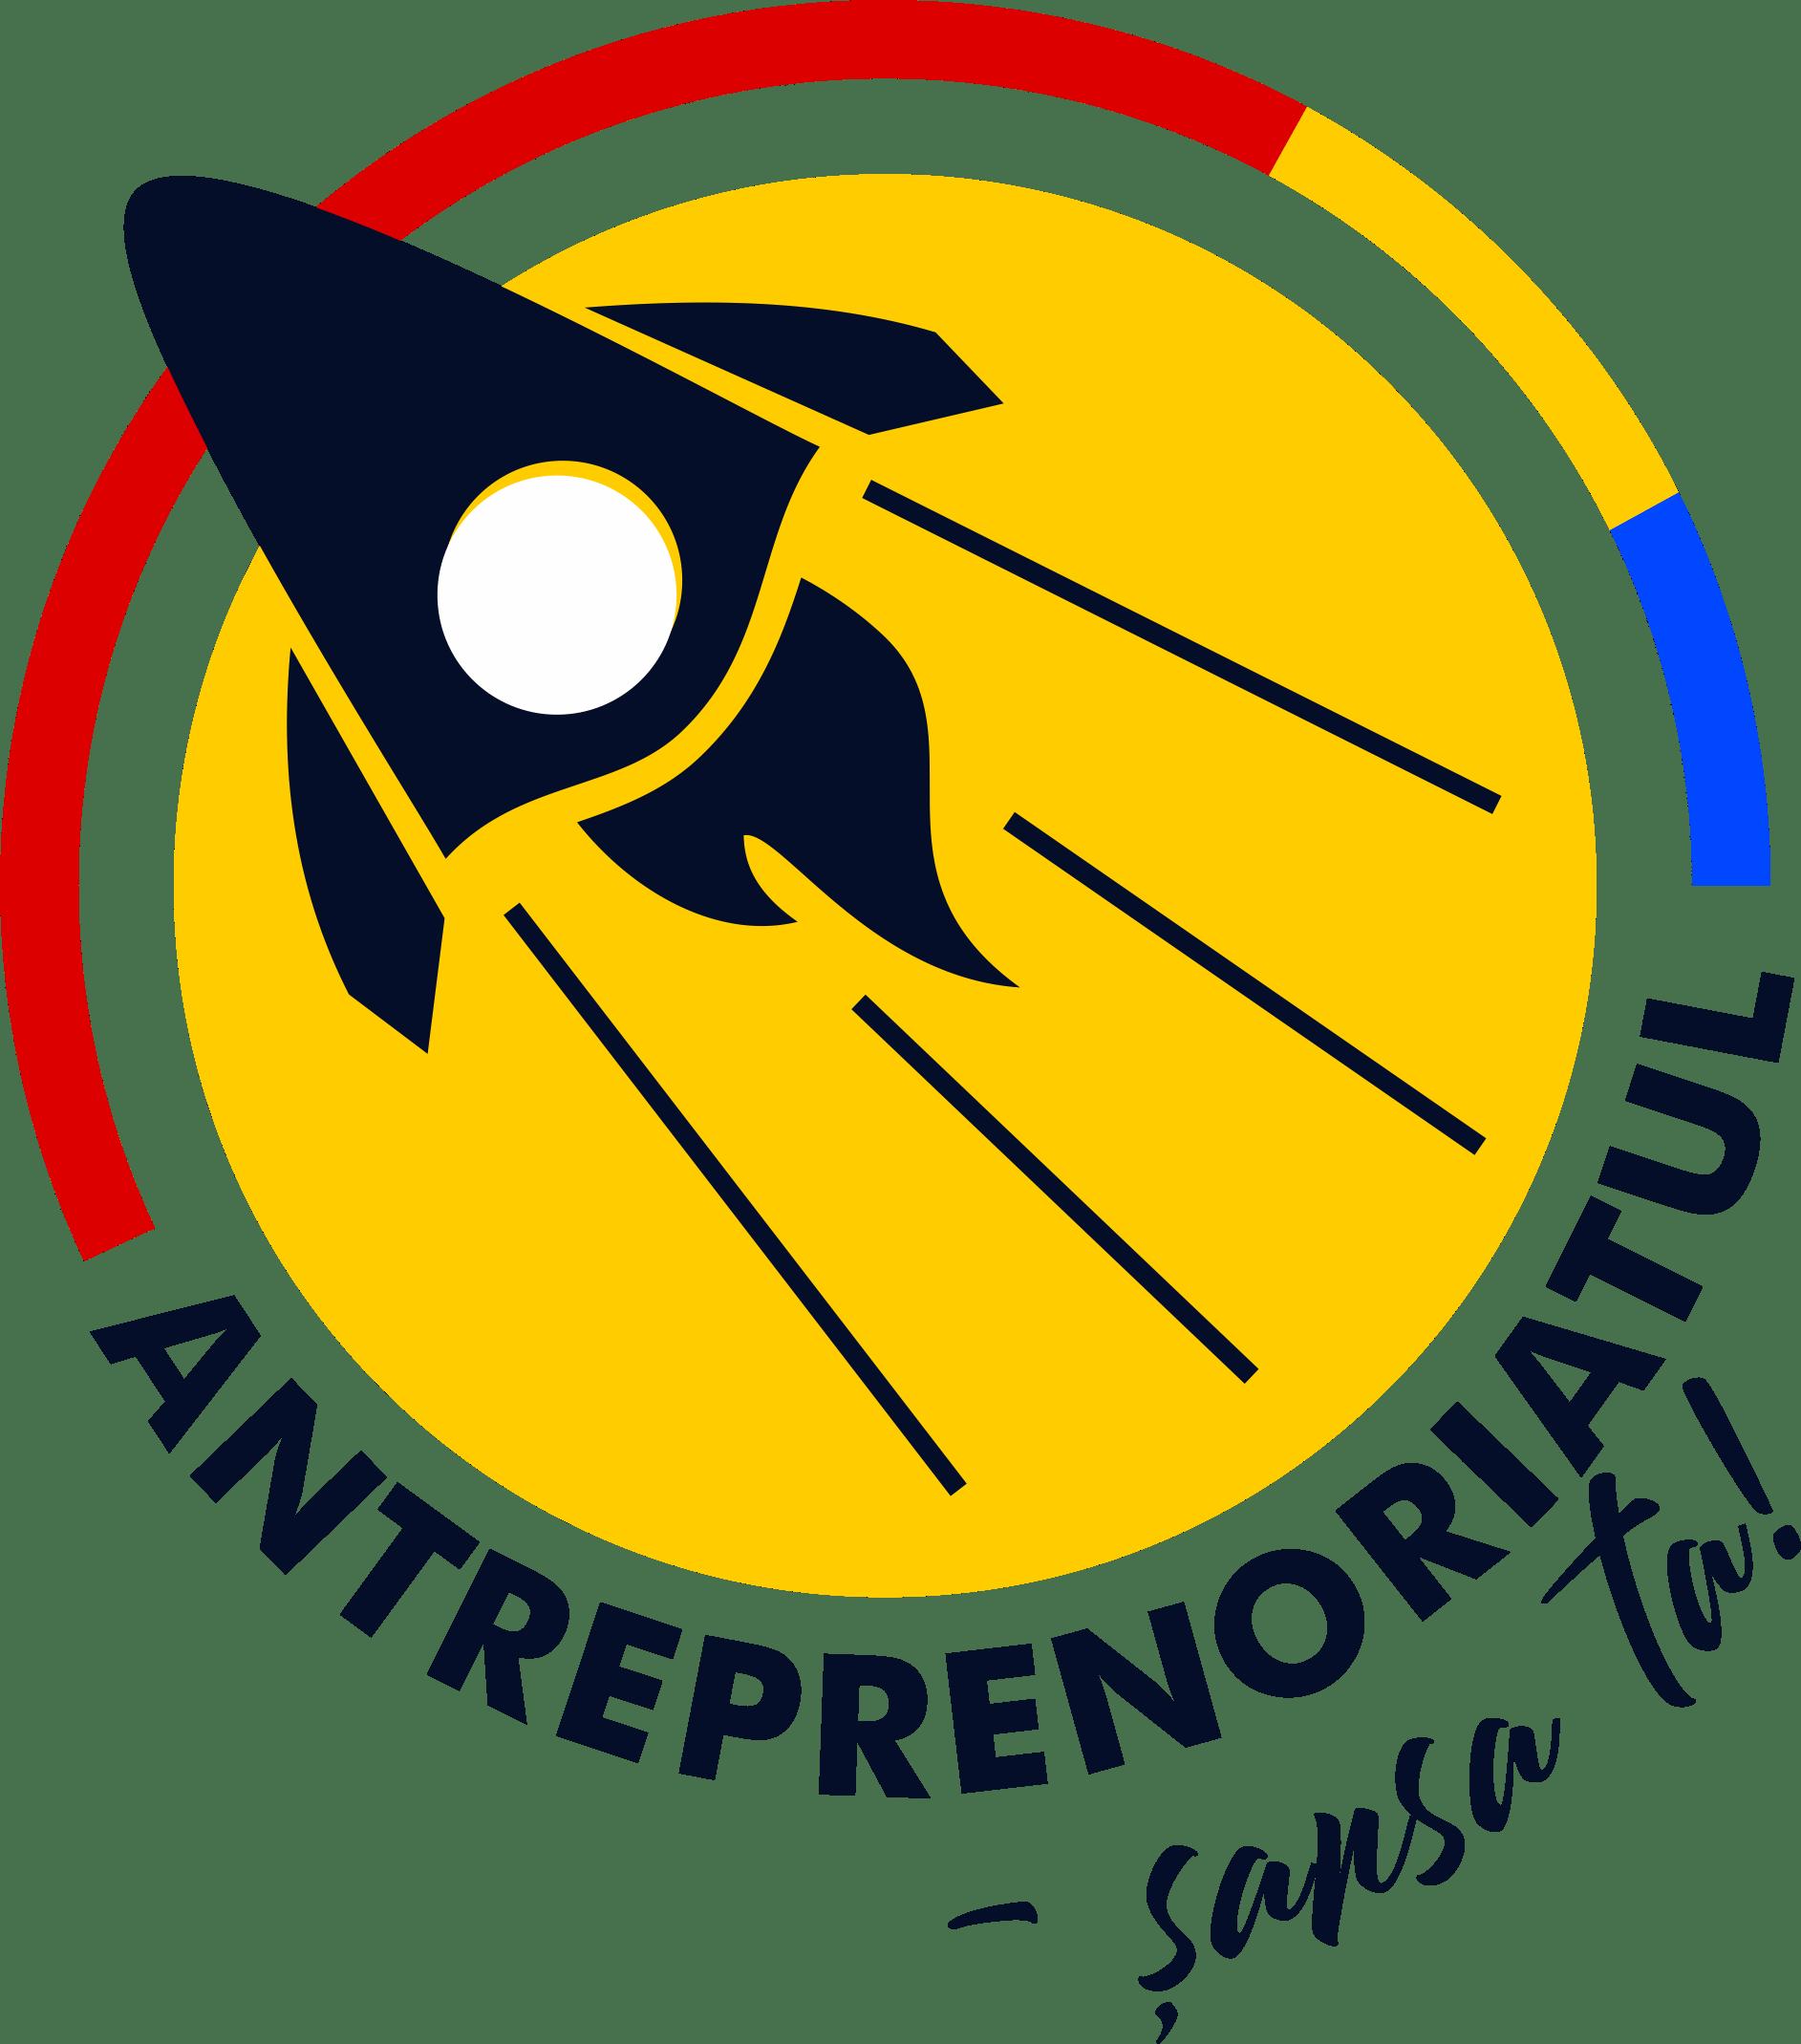 Antreprenoriatul – șansa ta!